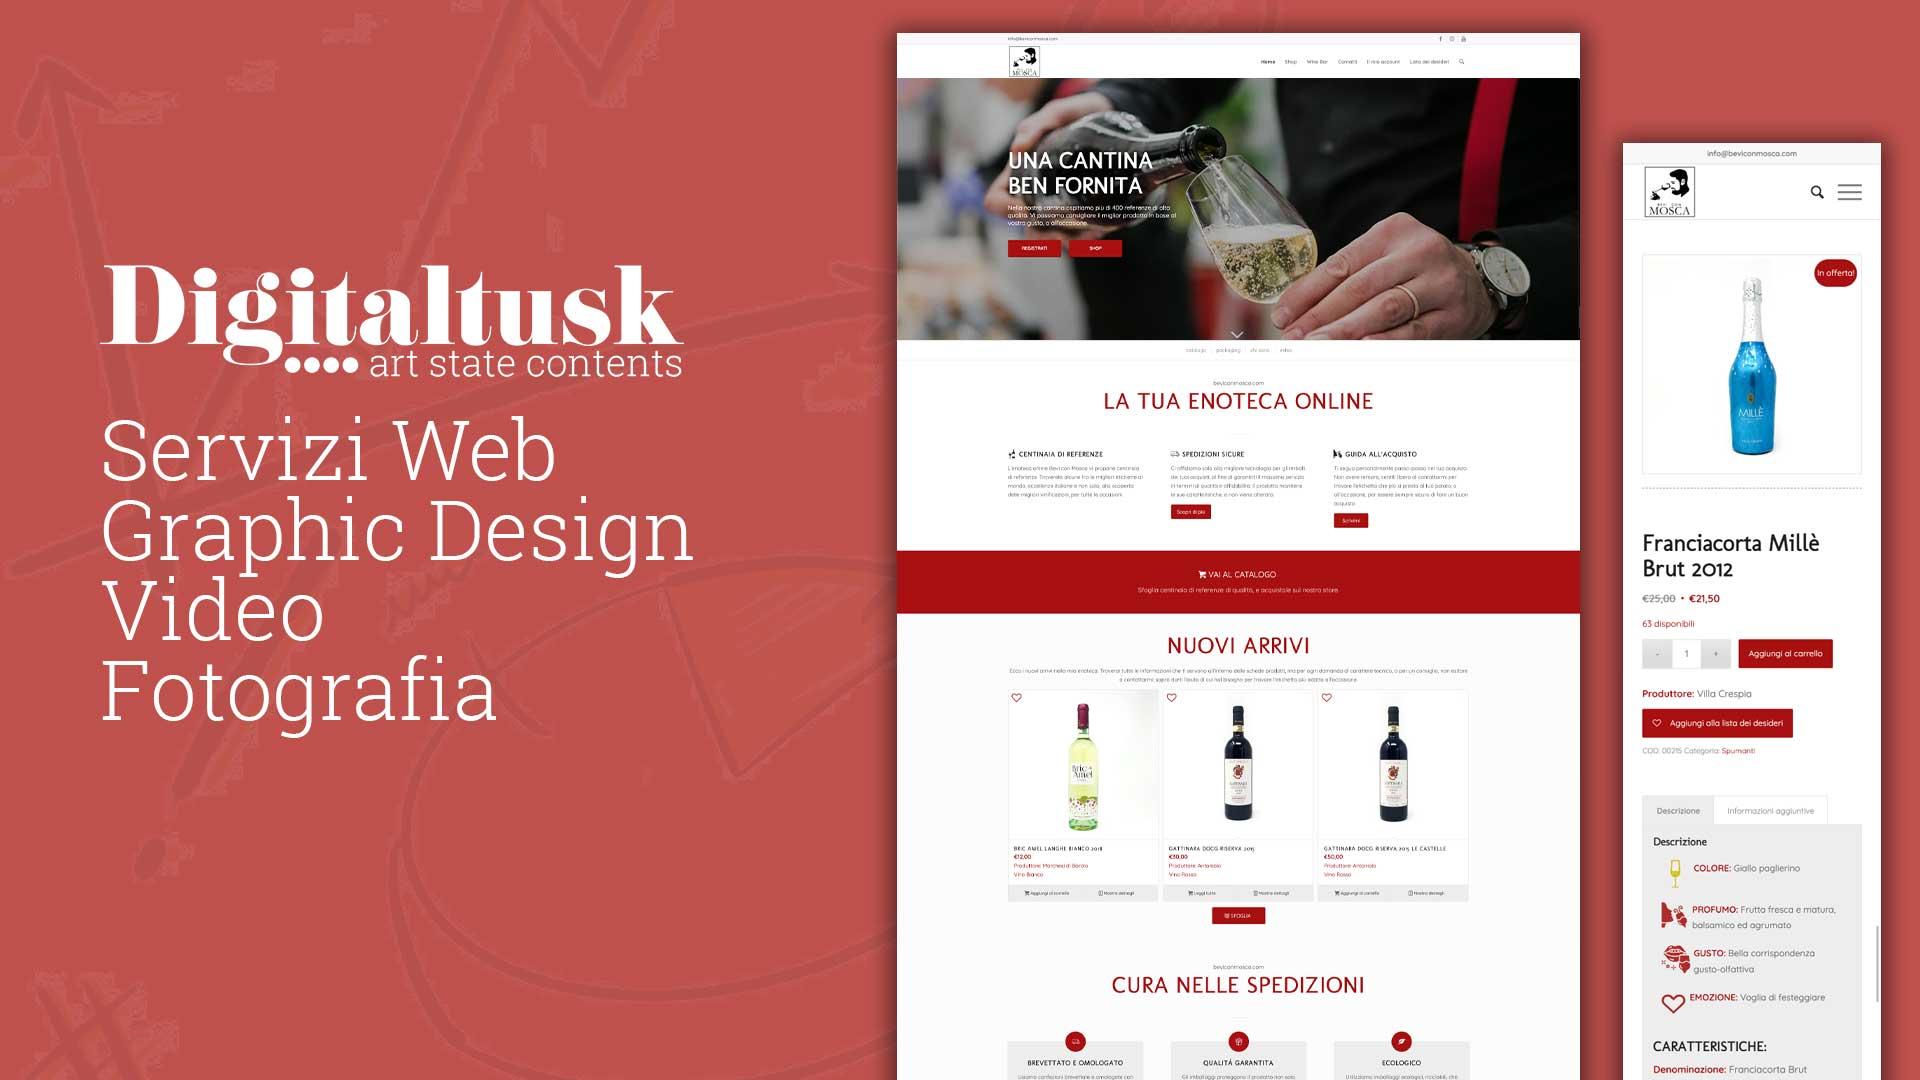 enoteca online bevi con mosca ecommerce digitaltusk